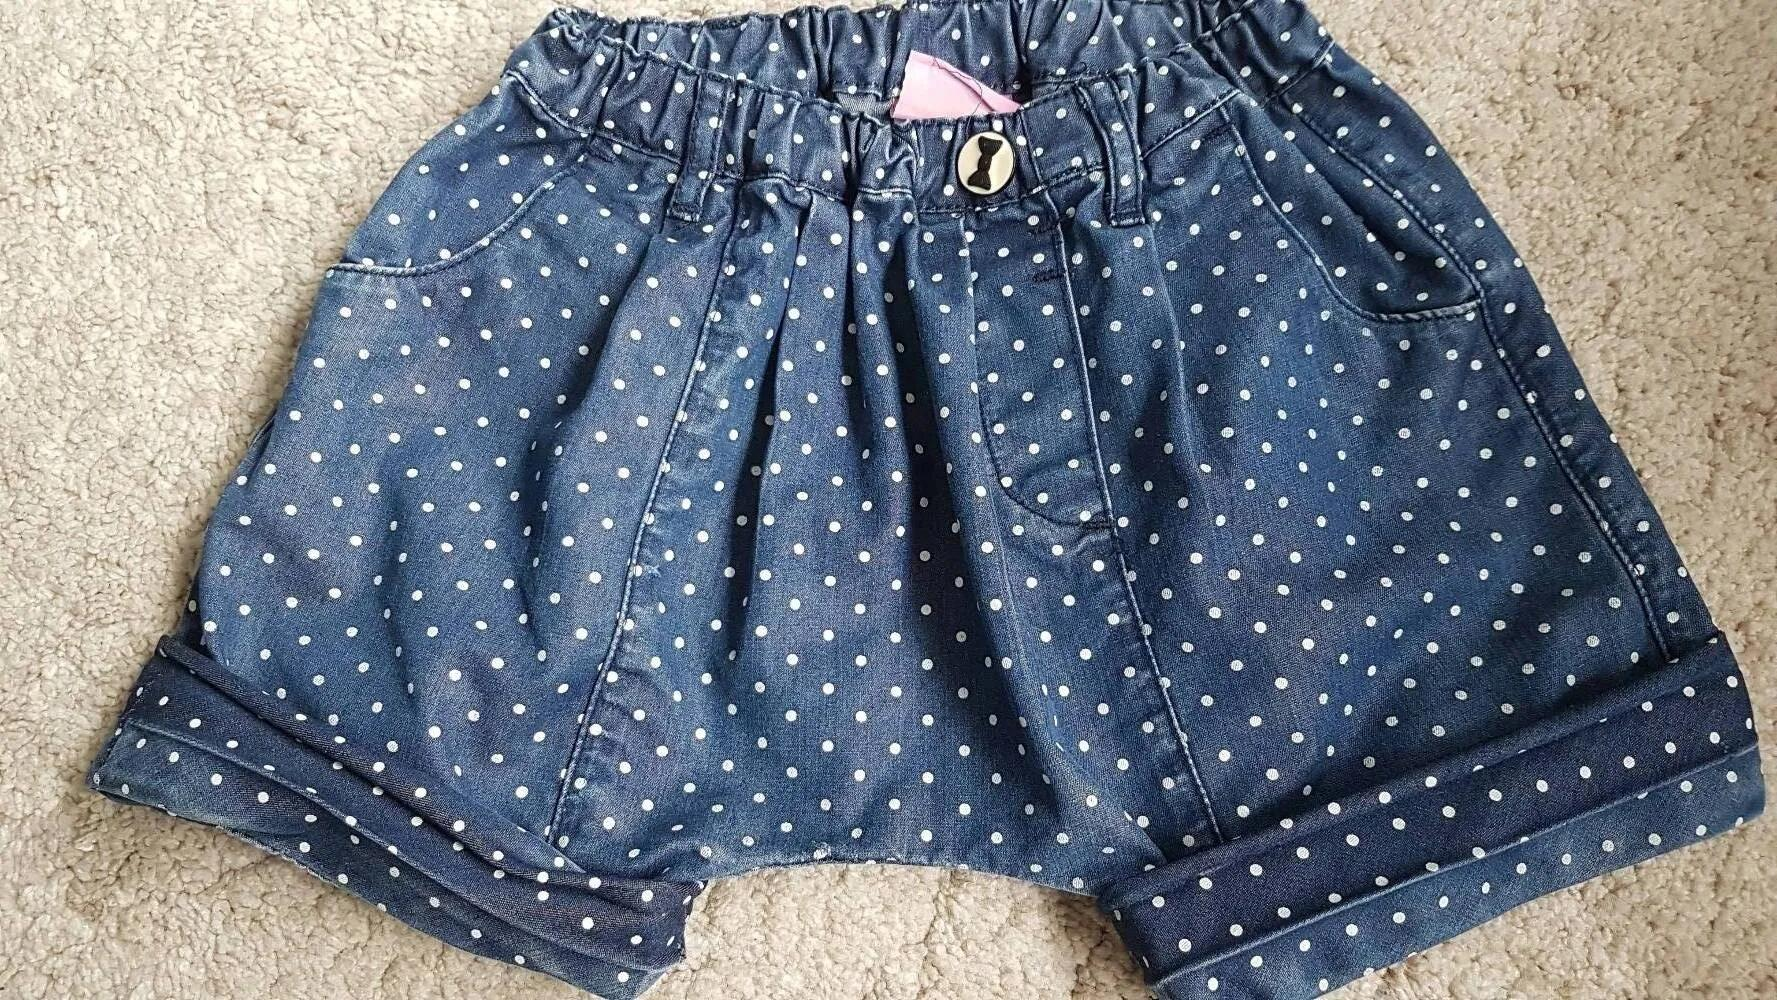 Xtep shorts